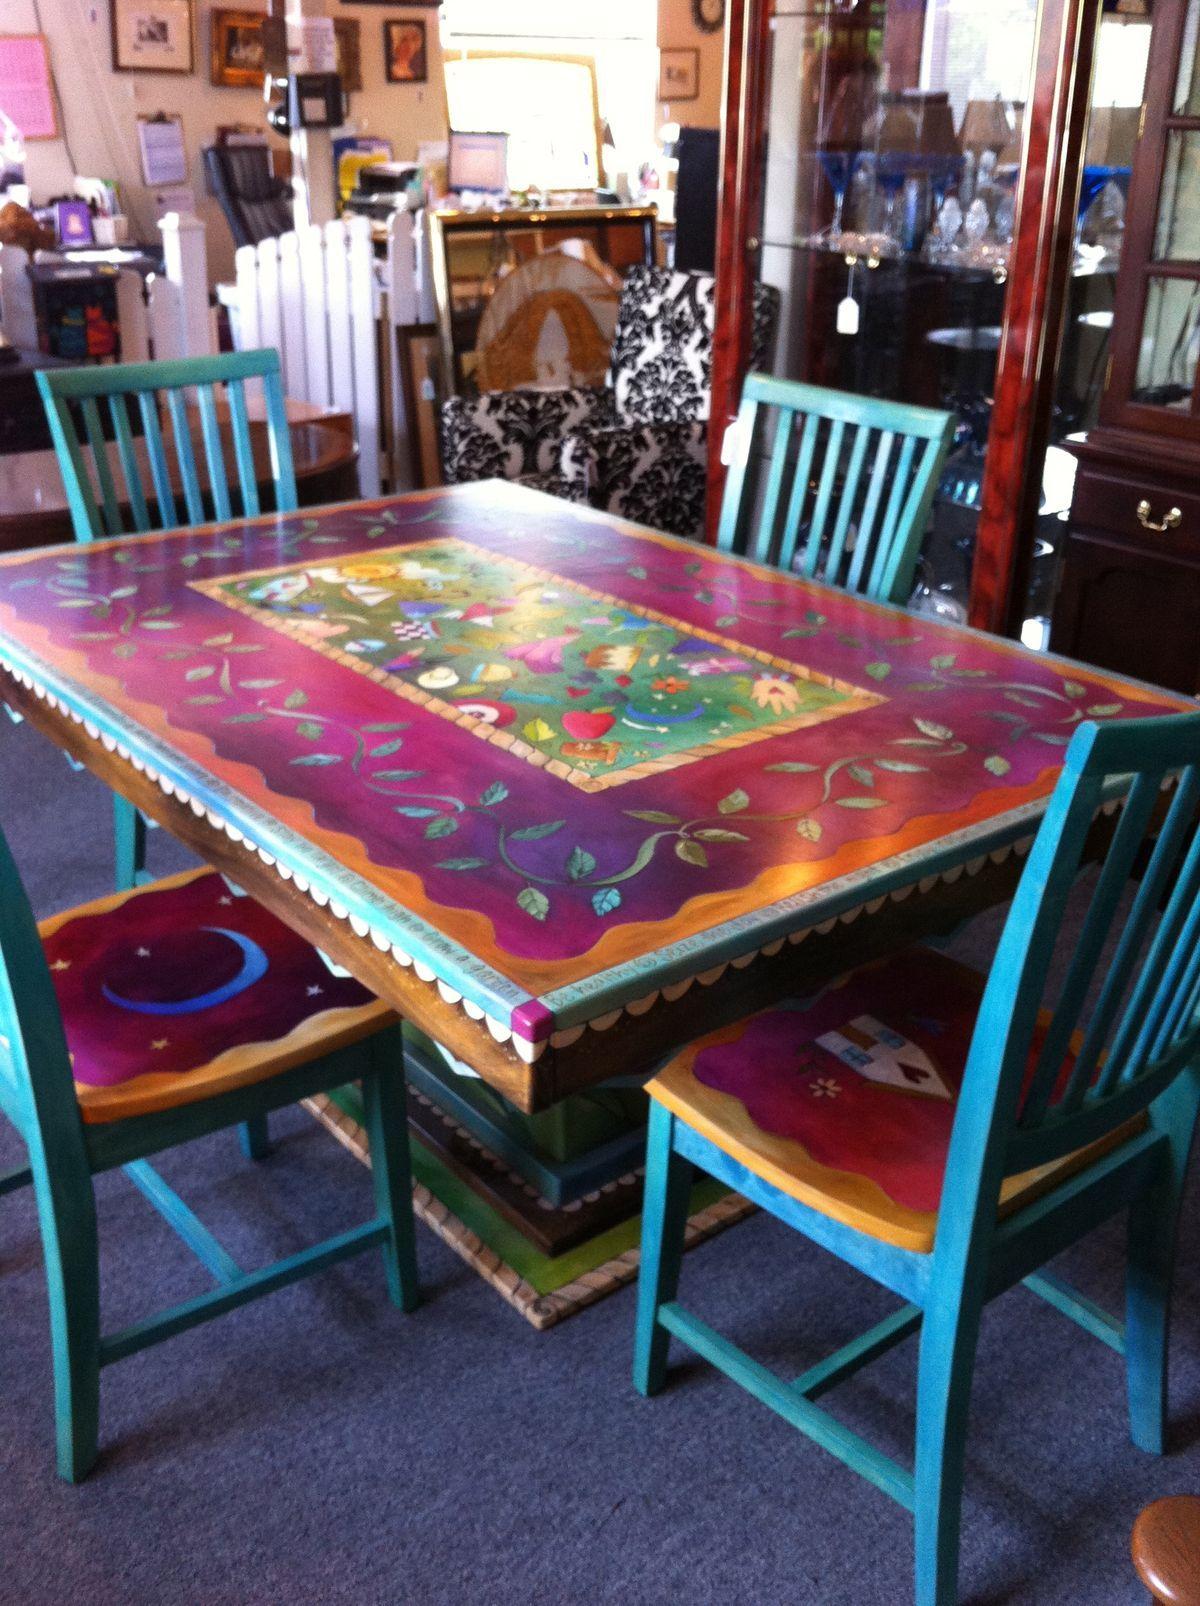 funky wooden chairs diy chair slipcover 2203d16e54bf7df7854eab9b233a4c7c jpg 1 2001 606 pixels